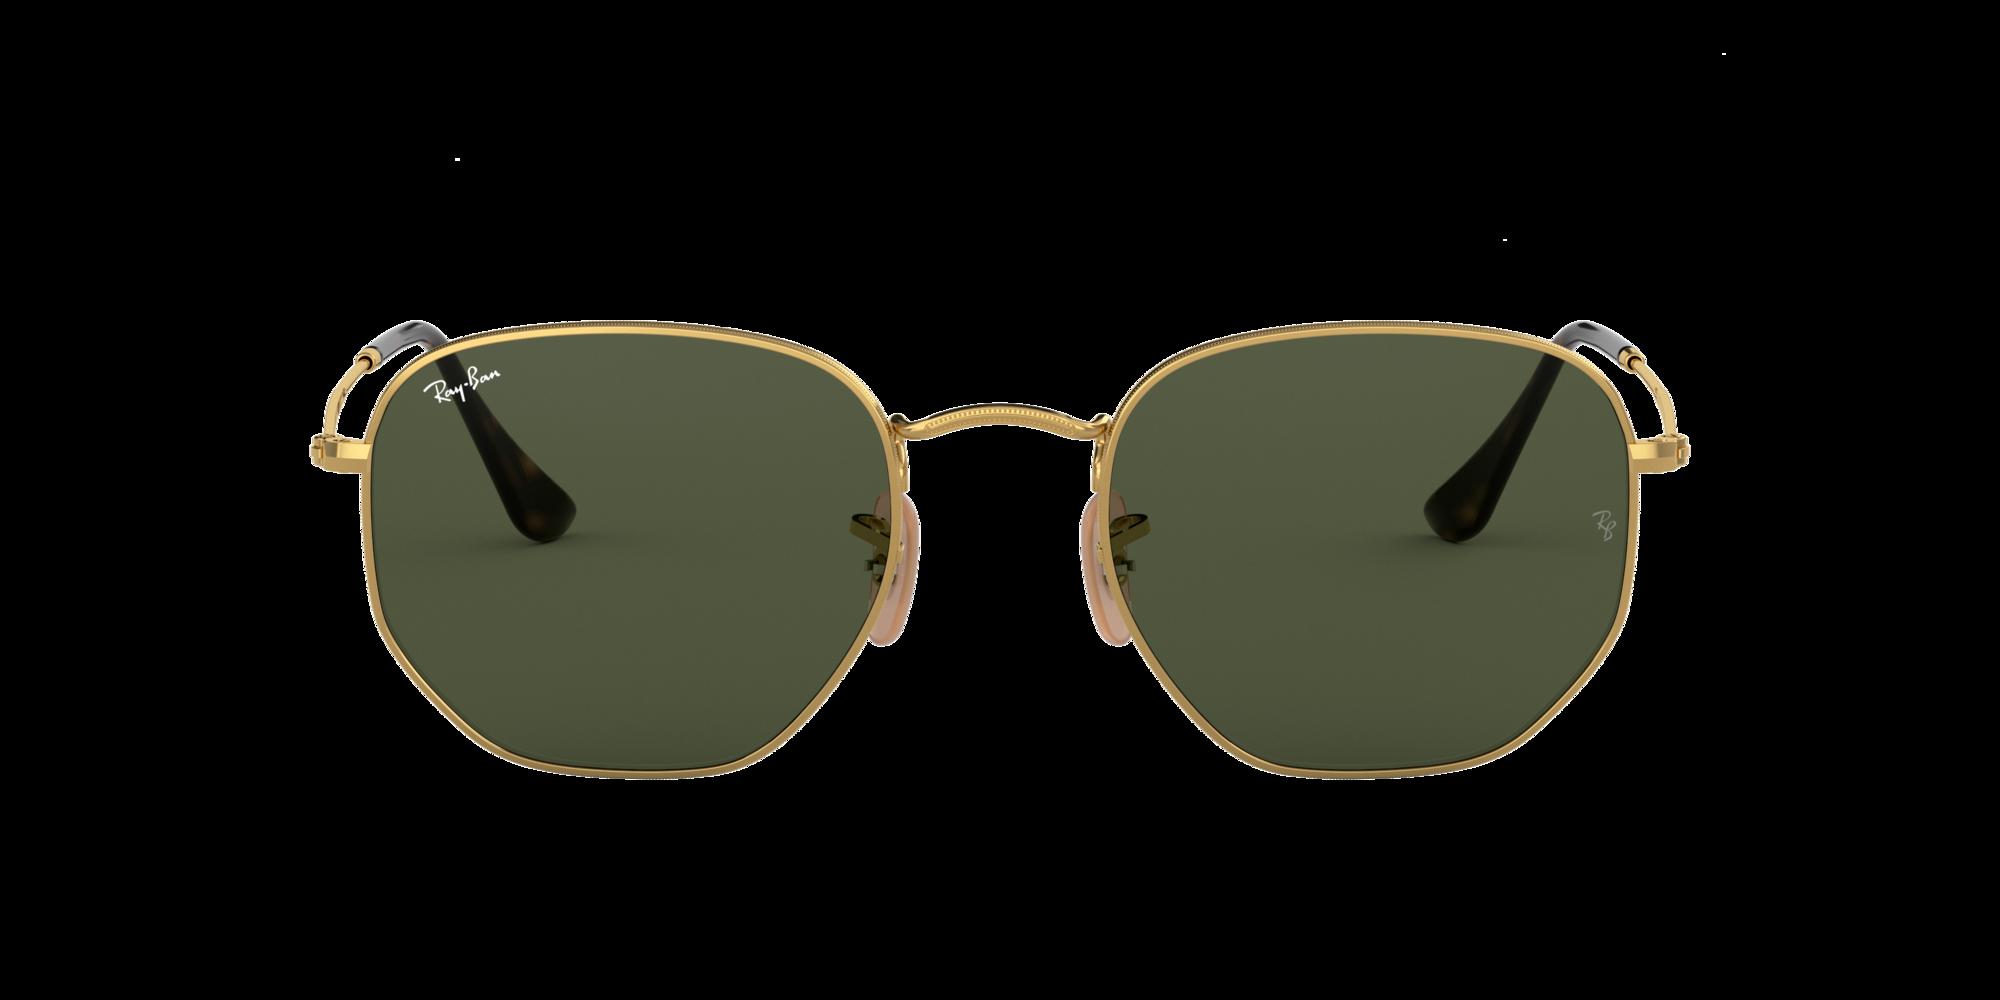 Image for RB3548N 51 HEXAGONAL from LensCrafters | Glasses, Prescription Glasses Online, Eyewear